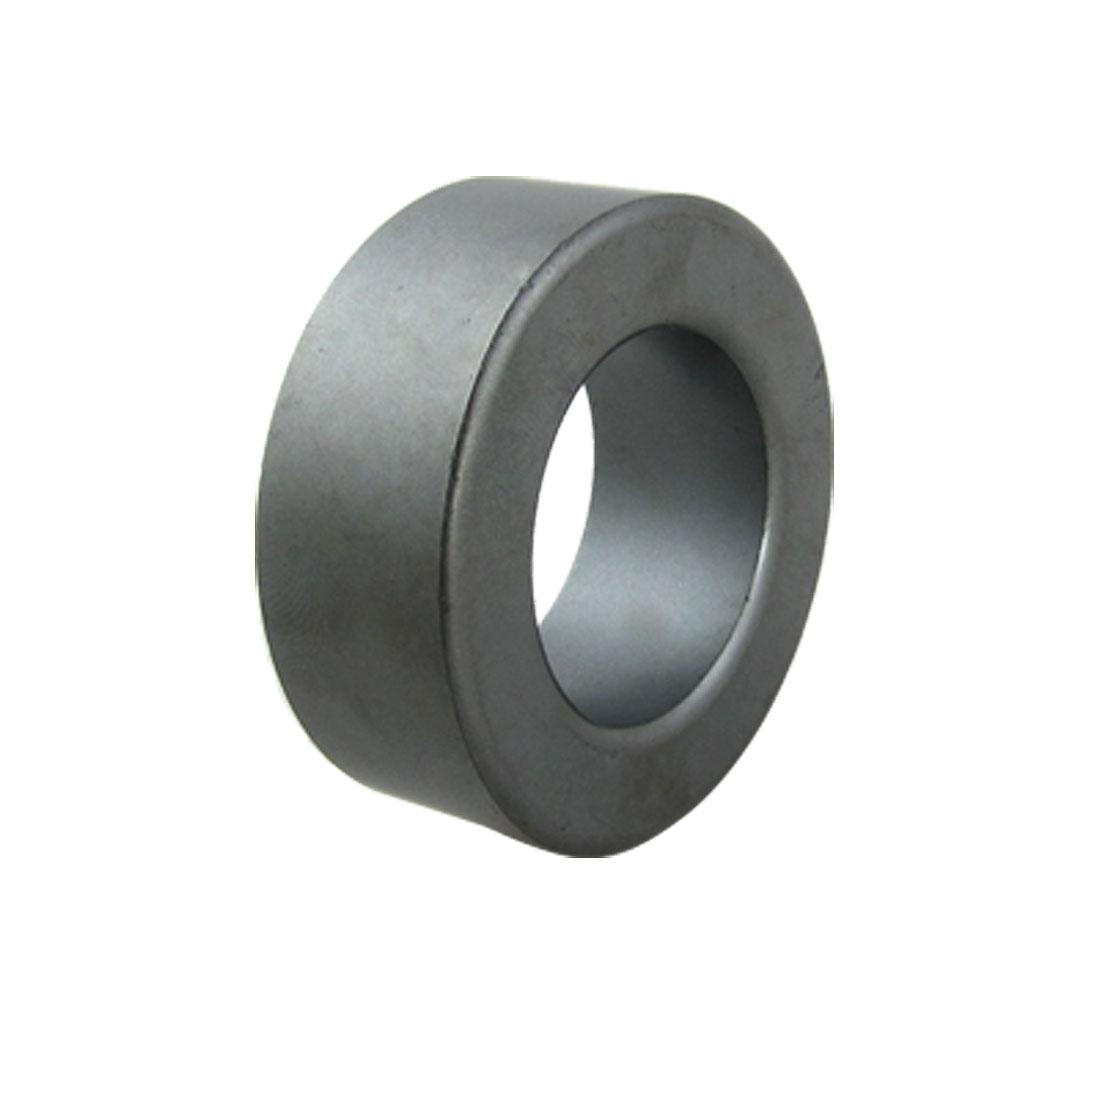 50 x 30 x 19mm Magnetism Ferrite Ring Core Tube Toroids